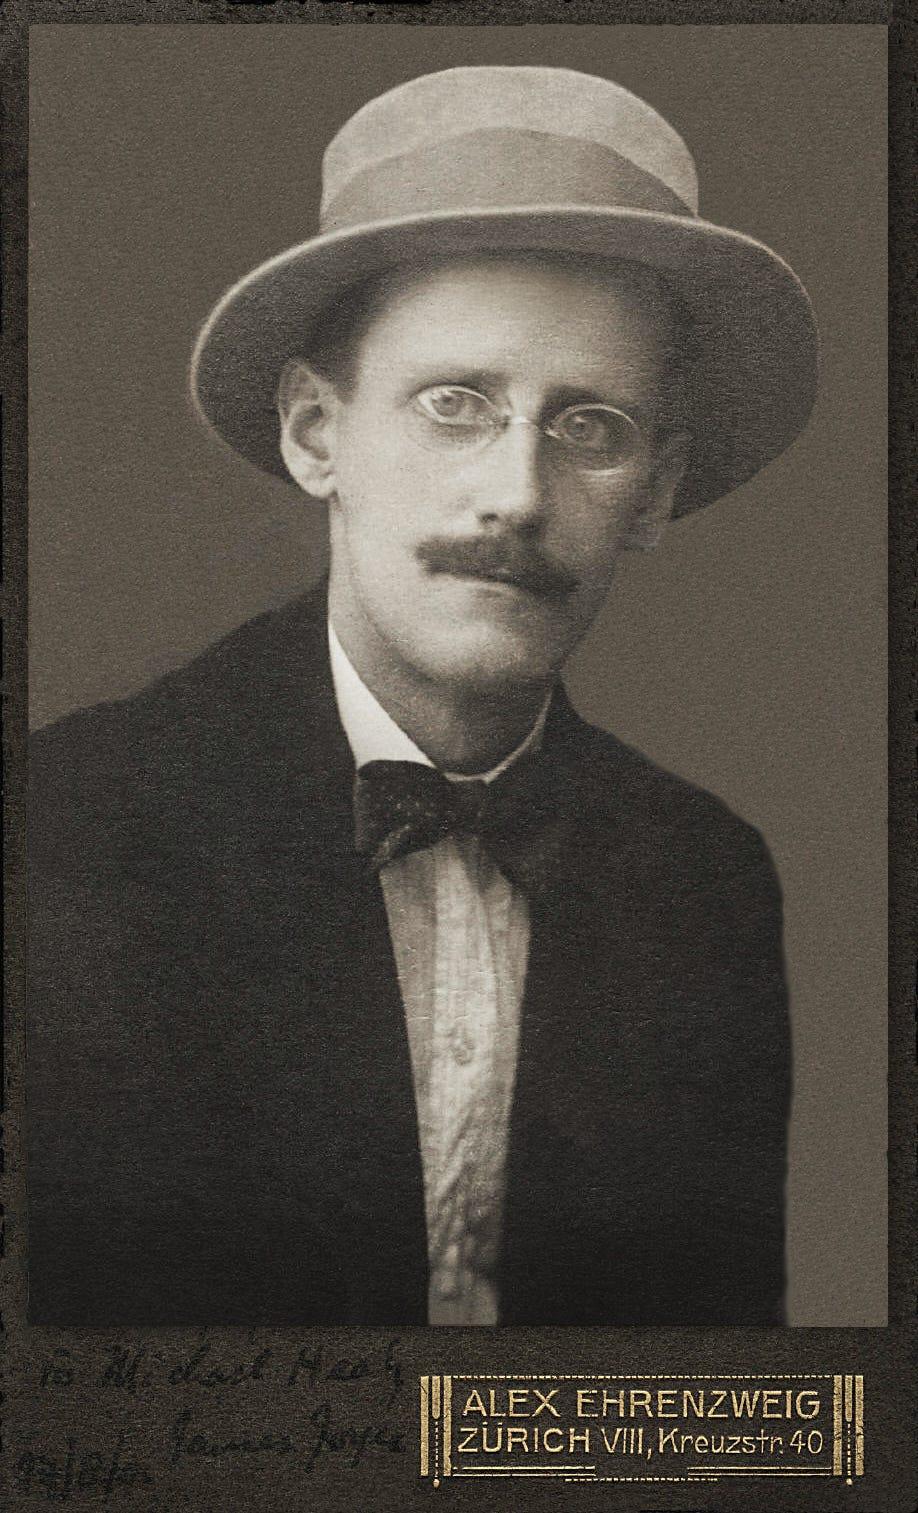 https://upload.wikimedia.org/wikipedia/commons/e/ef/James_Joyce_by_Alex_Ehrenzweig%2C_1915_restored.jpg